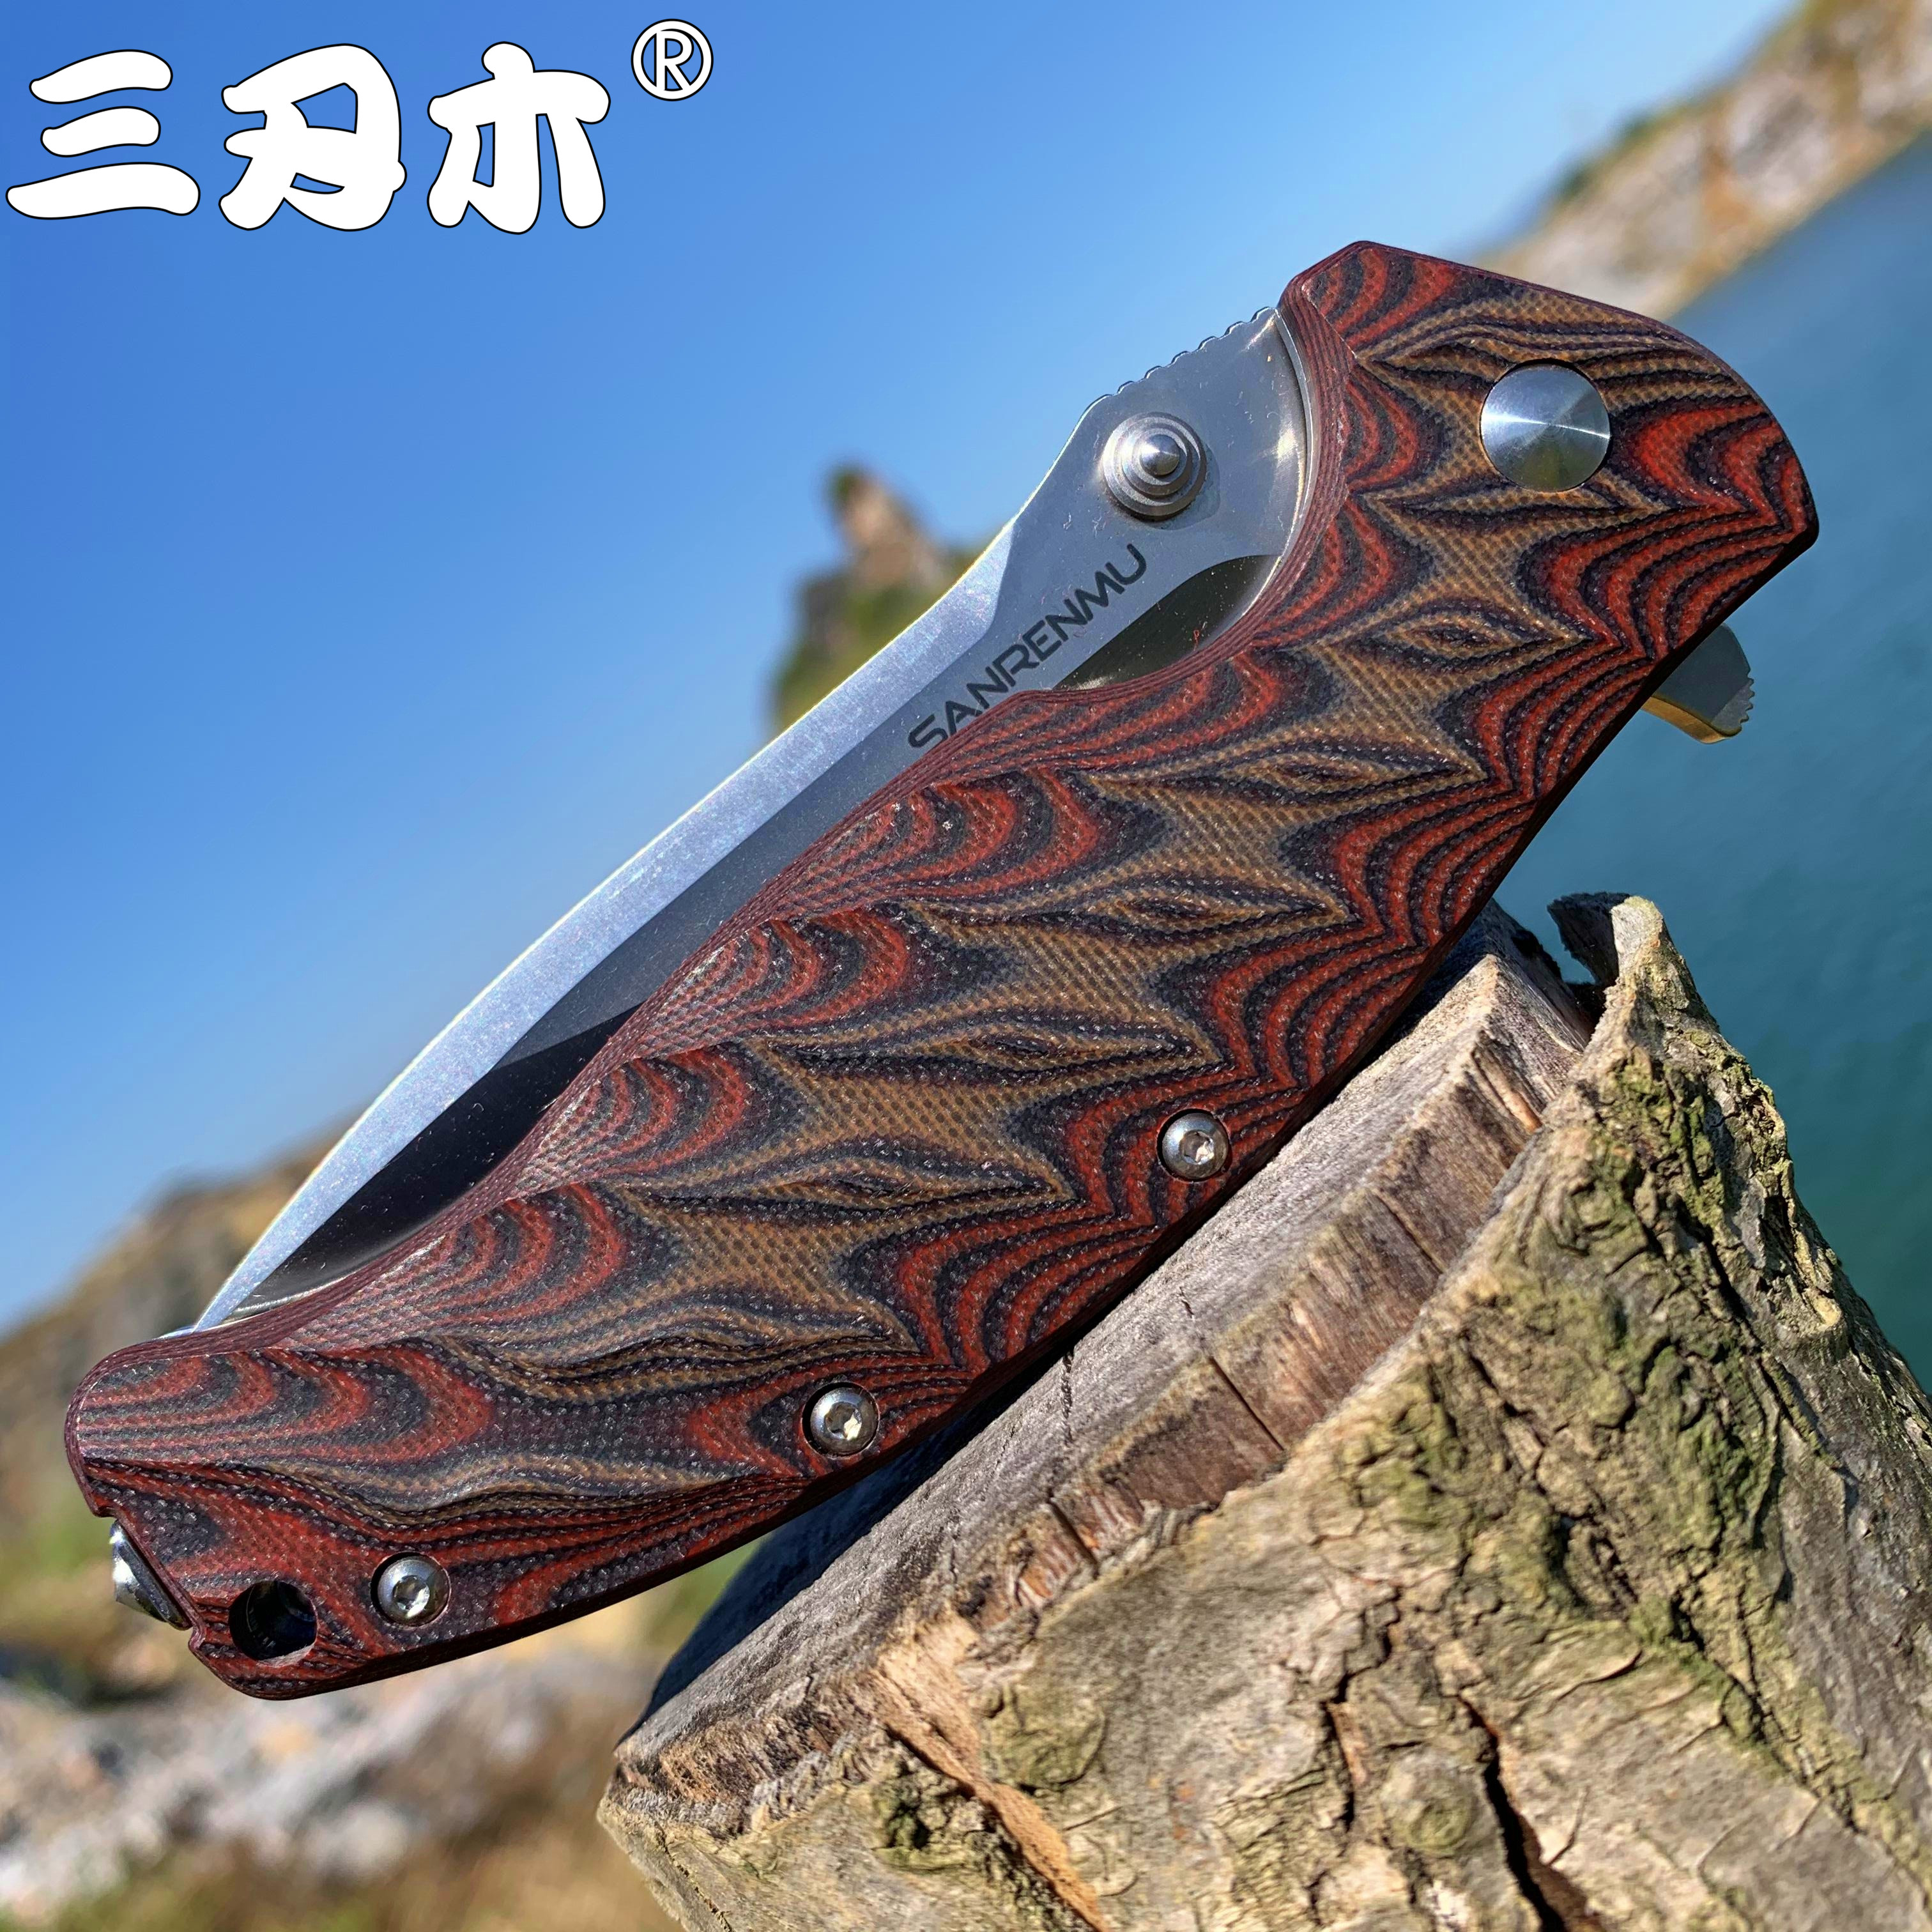 1005 Ball Outdoor 9Cr14 Camping SRM Bearing Steel Folding Pocket Blade Knife SANRENMU Survival EDC Flipper